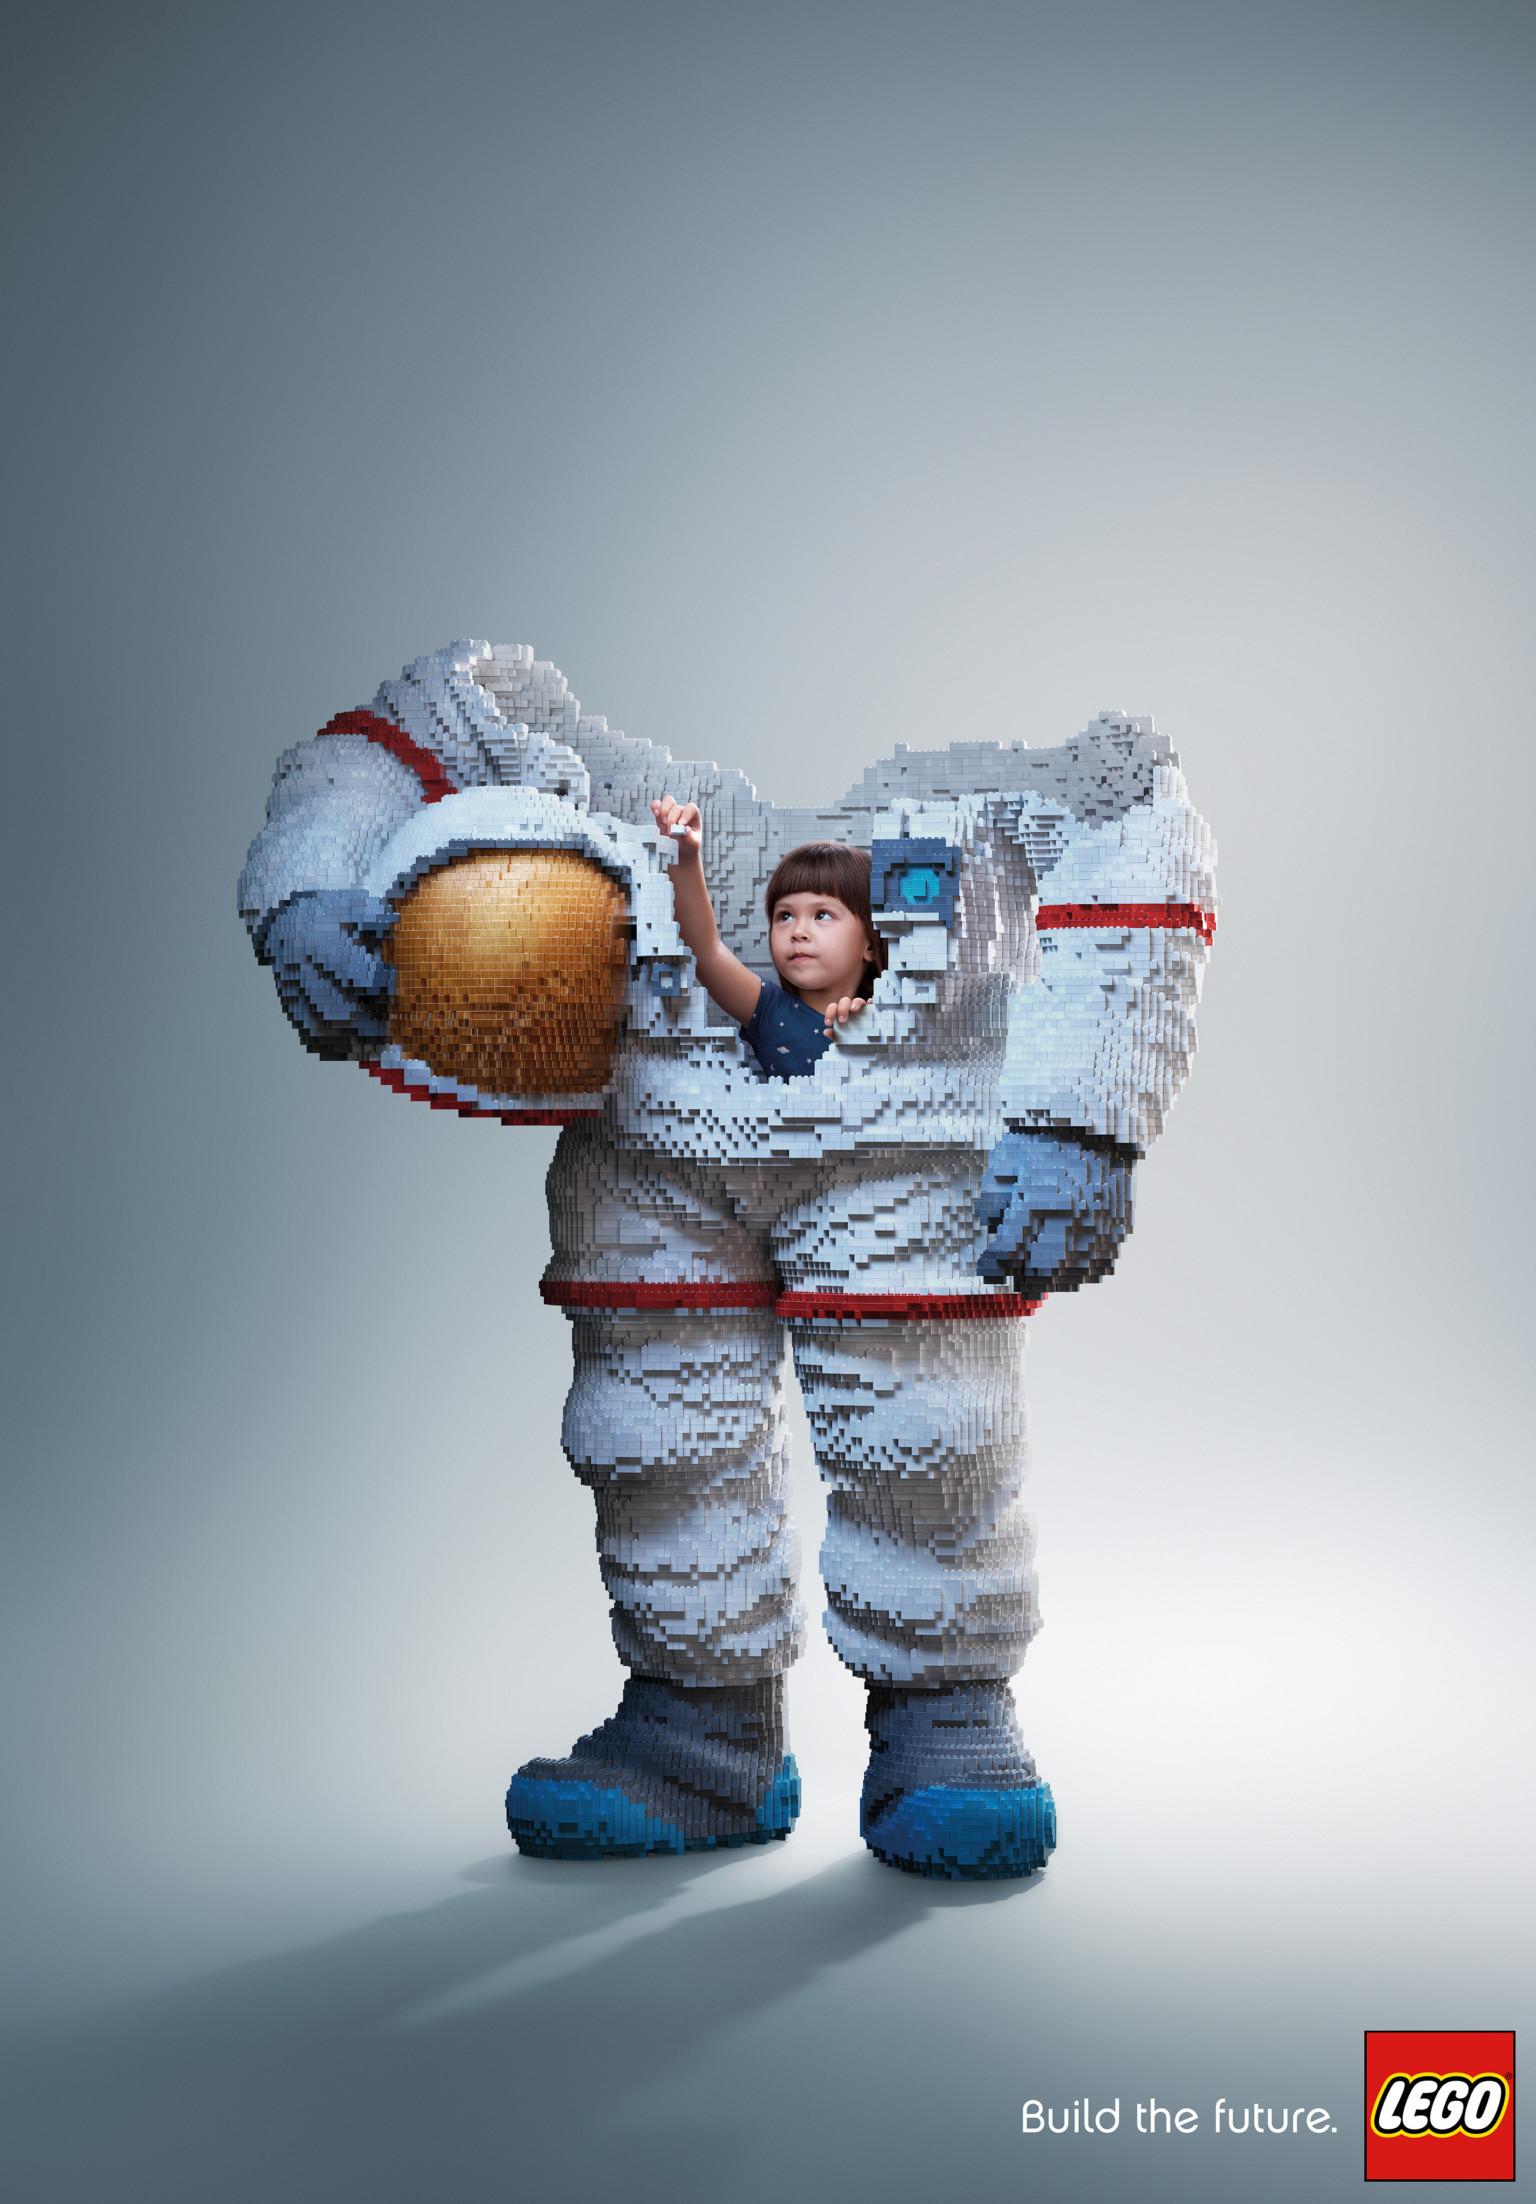 Creative Lego constructions bring fantastical moments to life